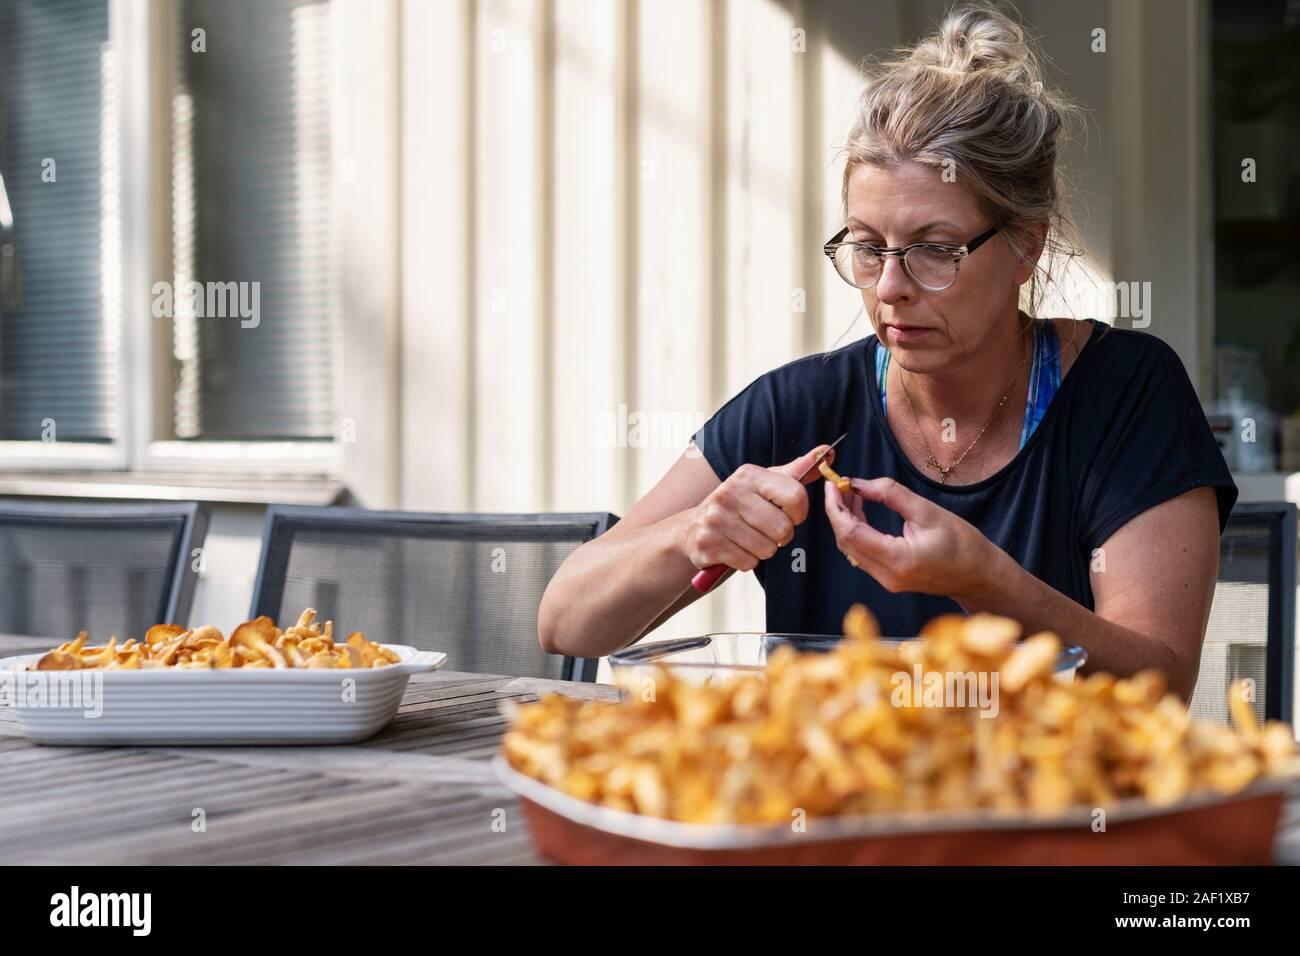 Woman cleaning chanterelles mushrooms Stock Photo